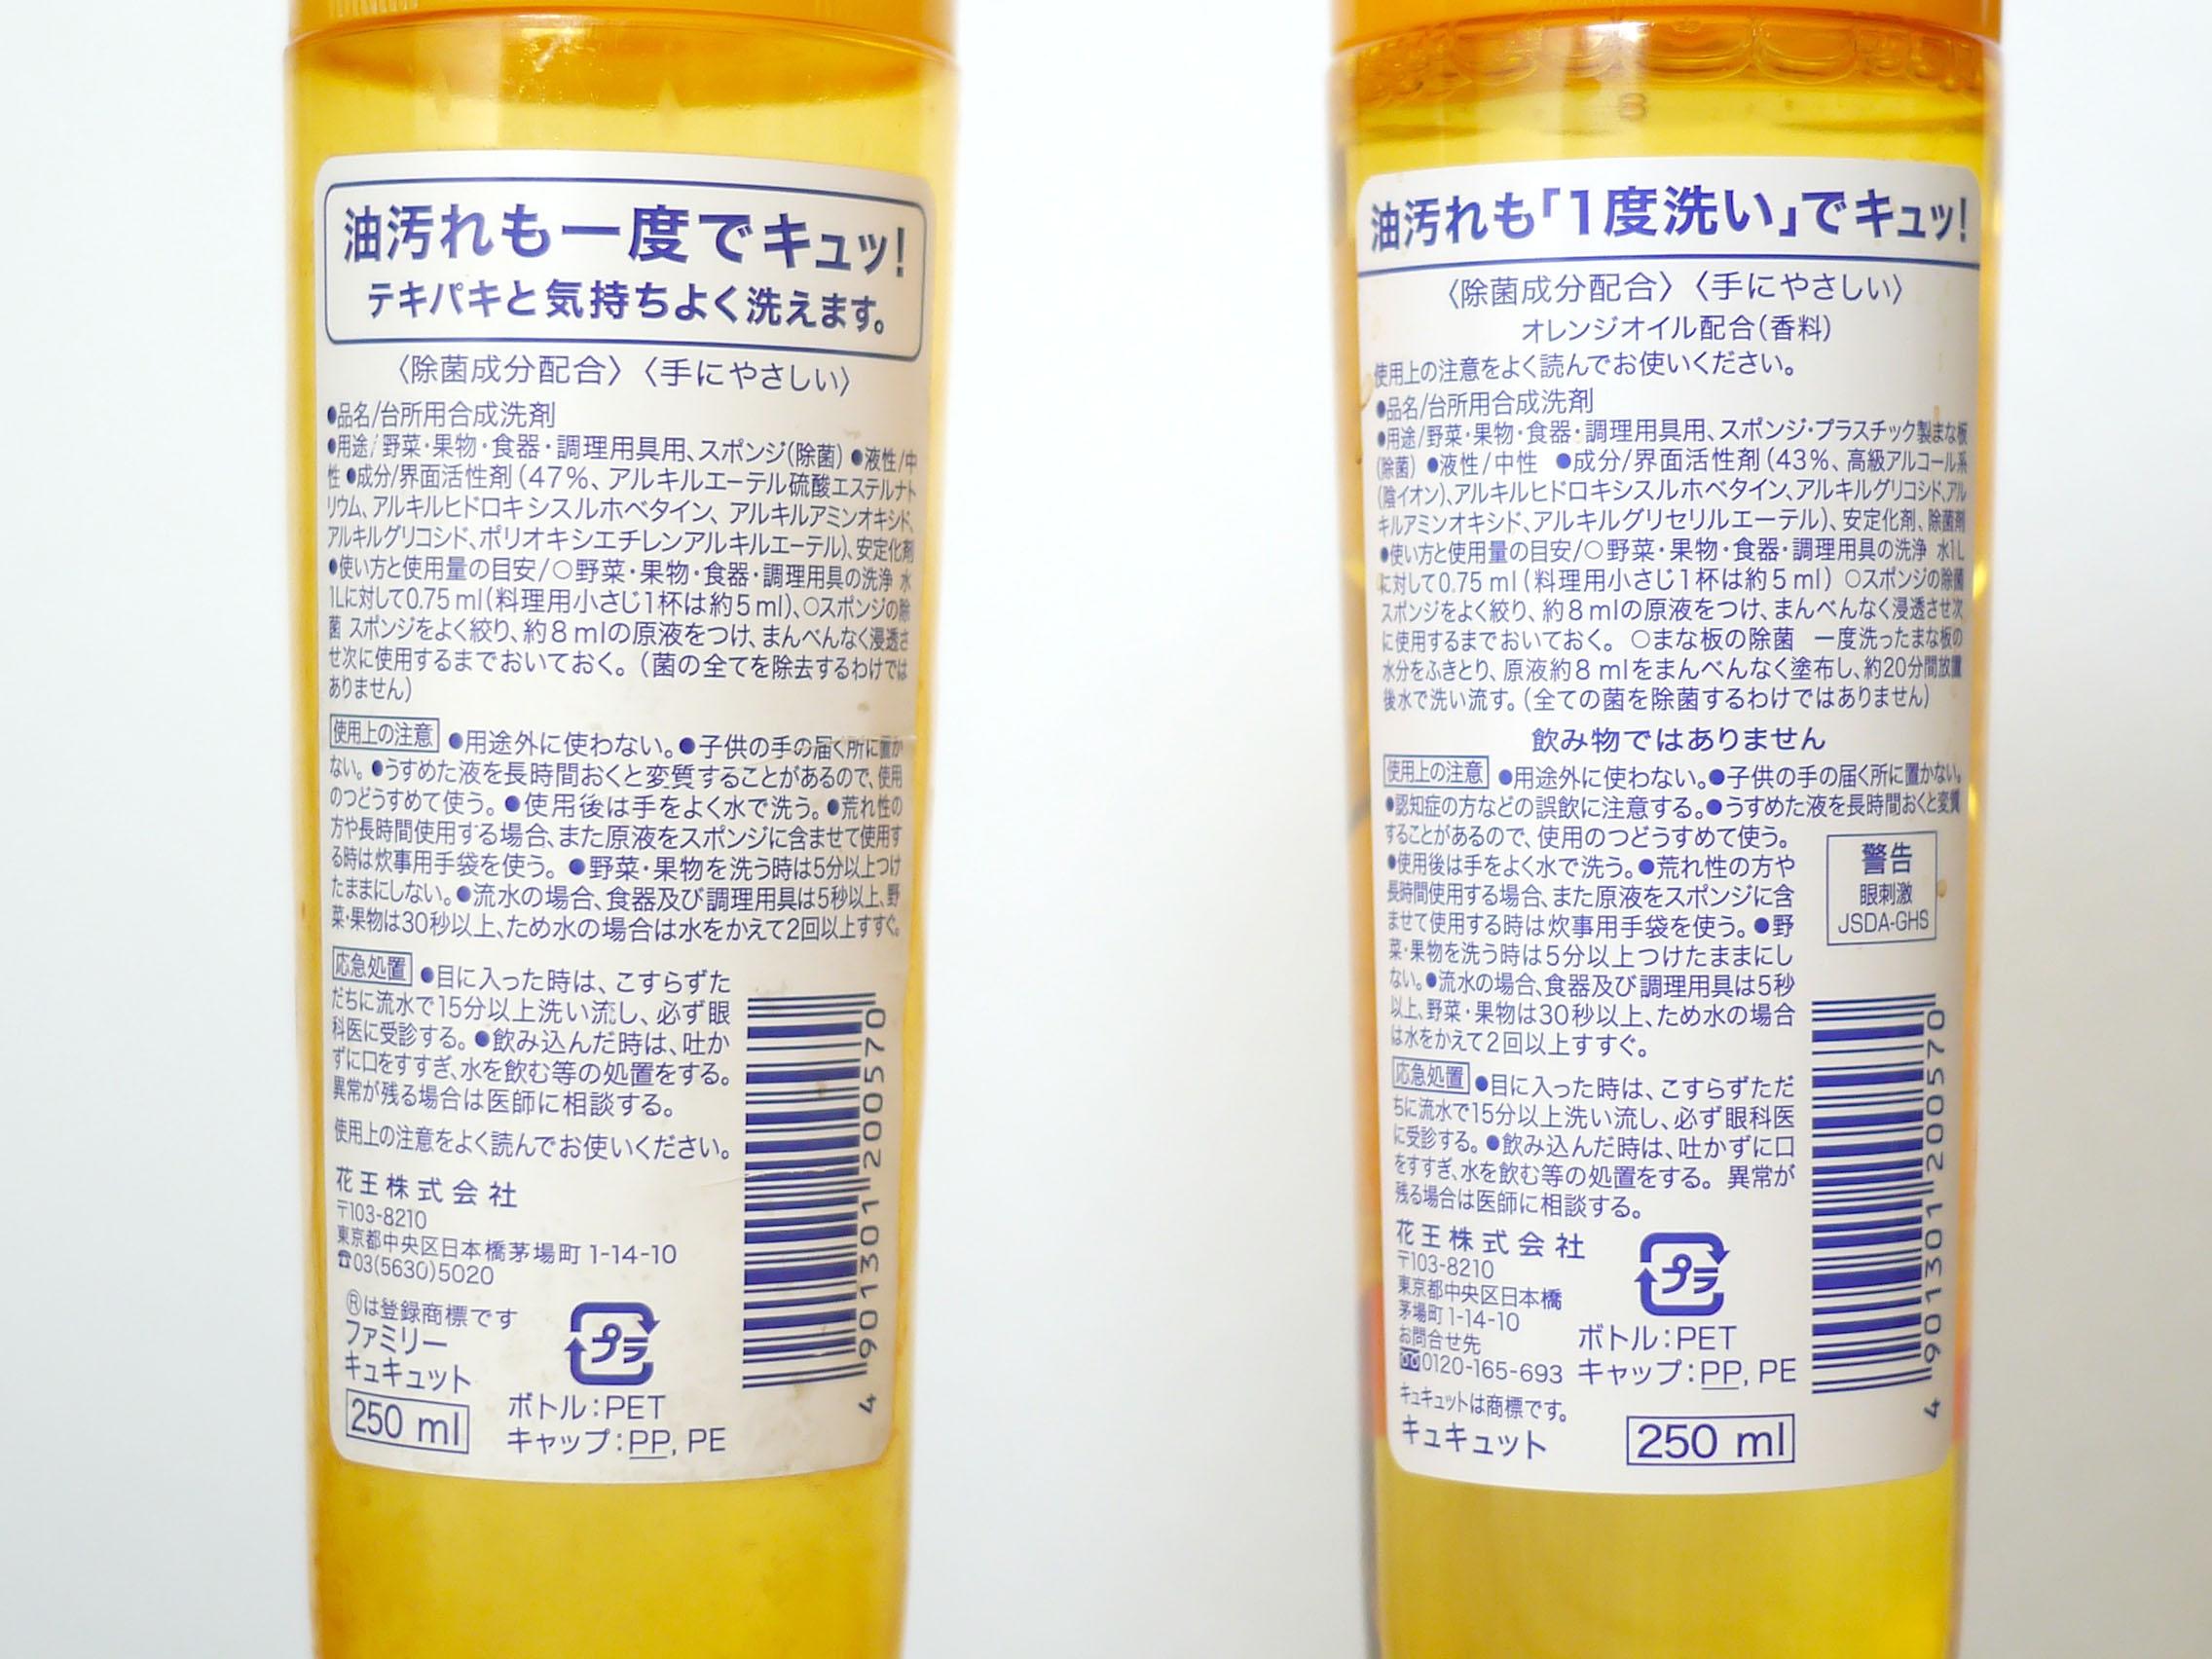 https://cdn-ak.f.st-hatena.com/images/fotolife/I/Imamura/20130328/20130328145700_original.jpg